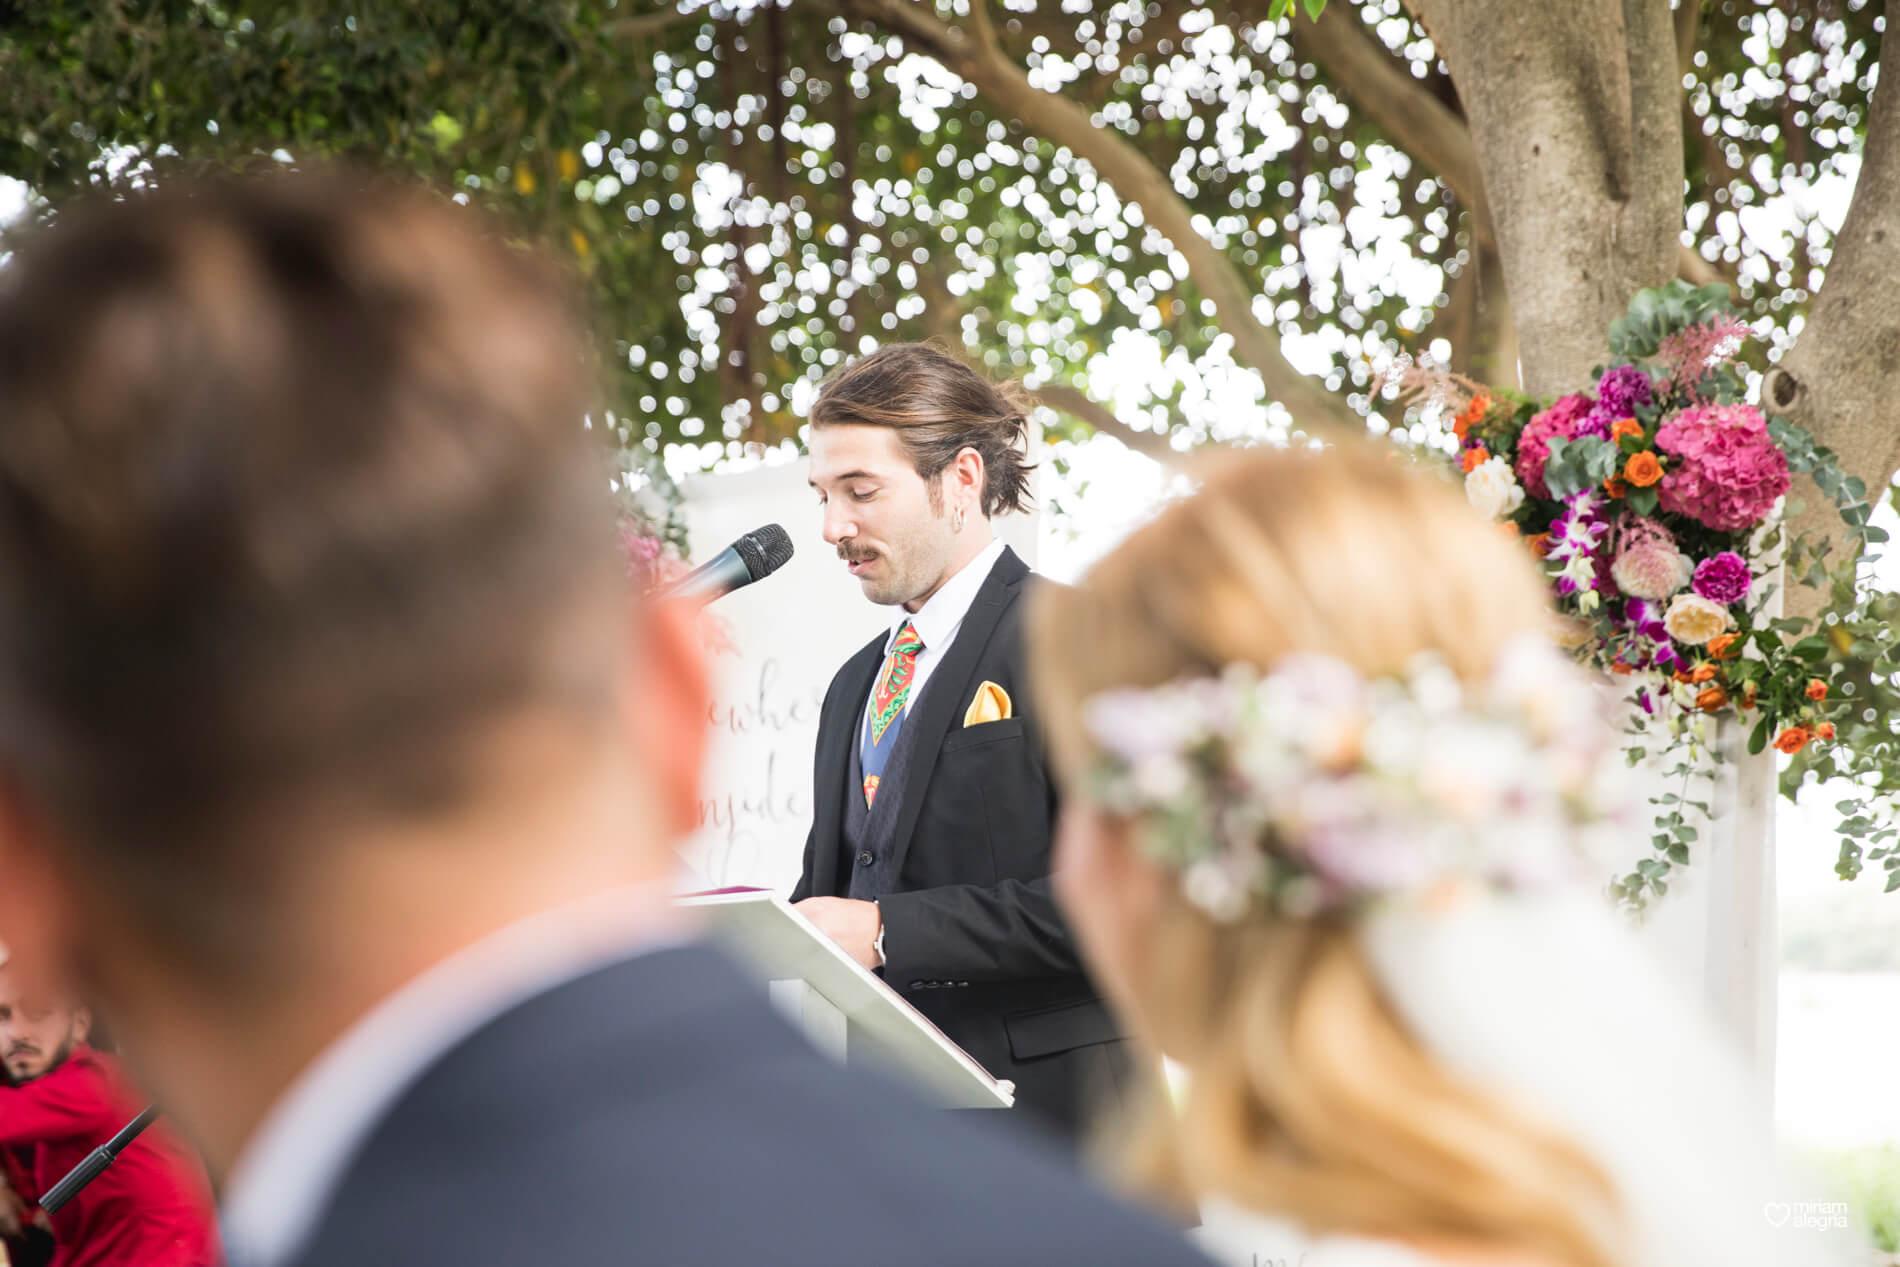 la-boda-de-alemc7-miriam-alegria-fotografos-boda-murcia-50